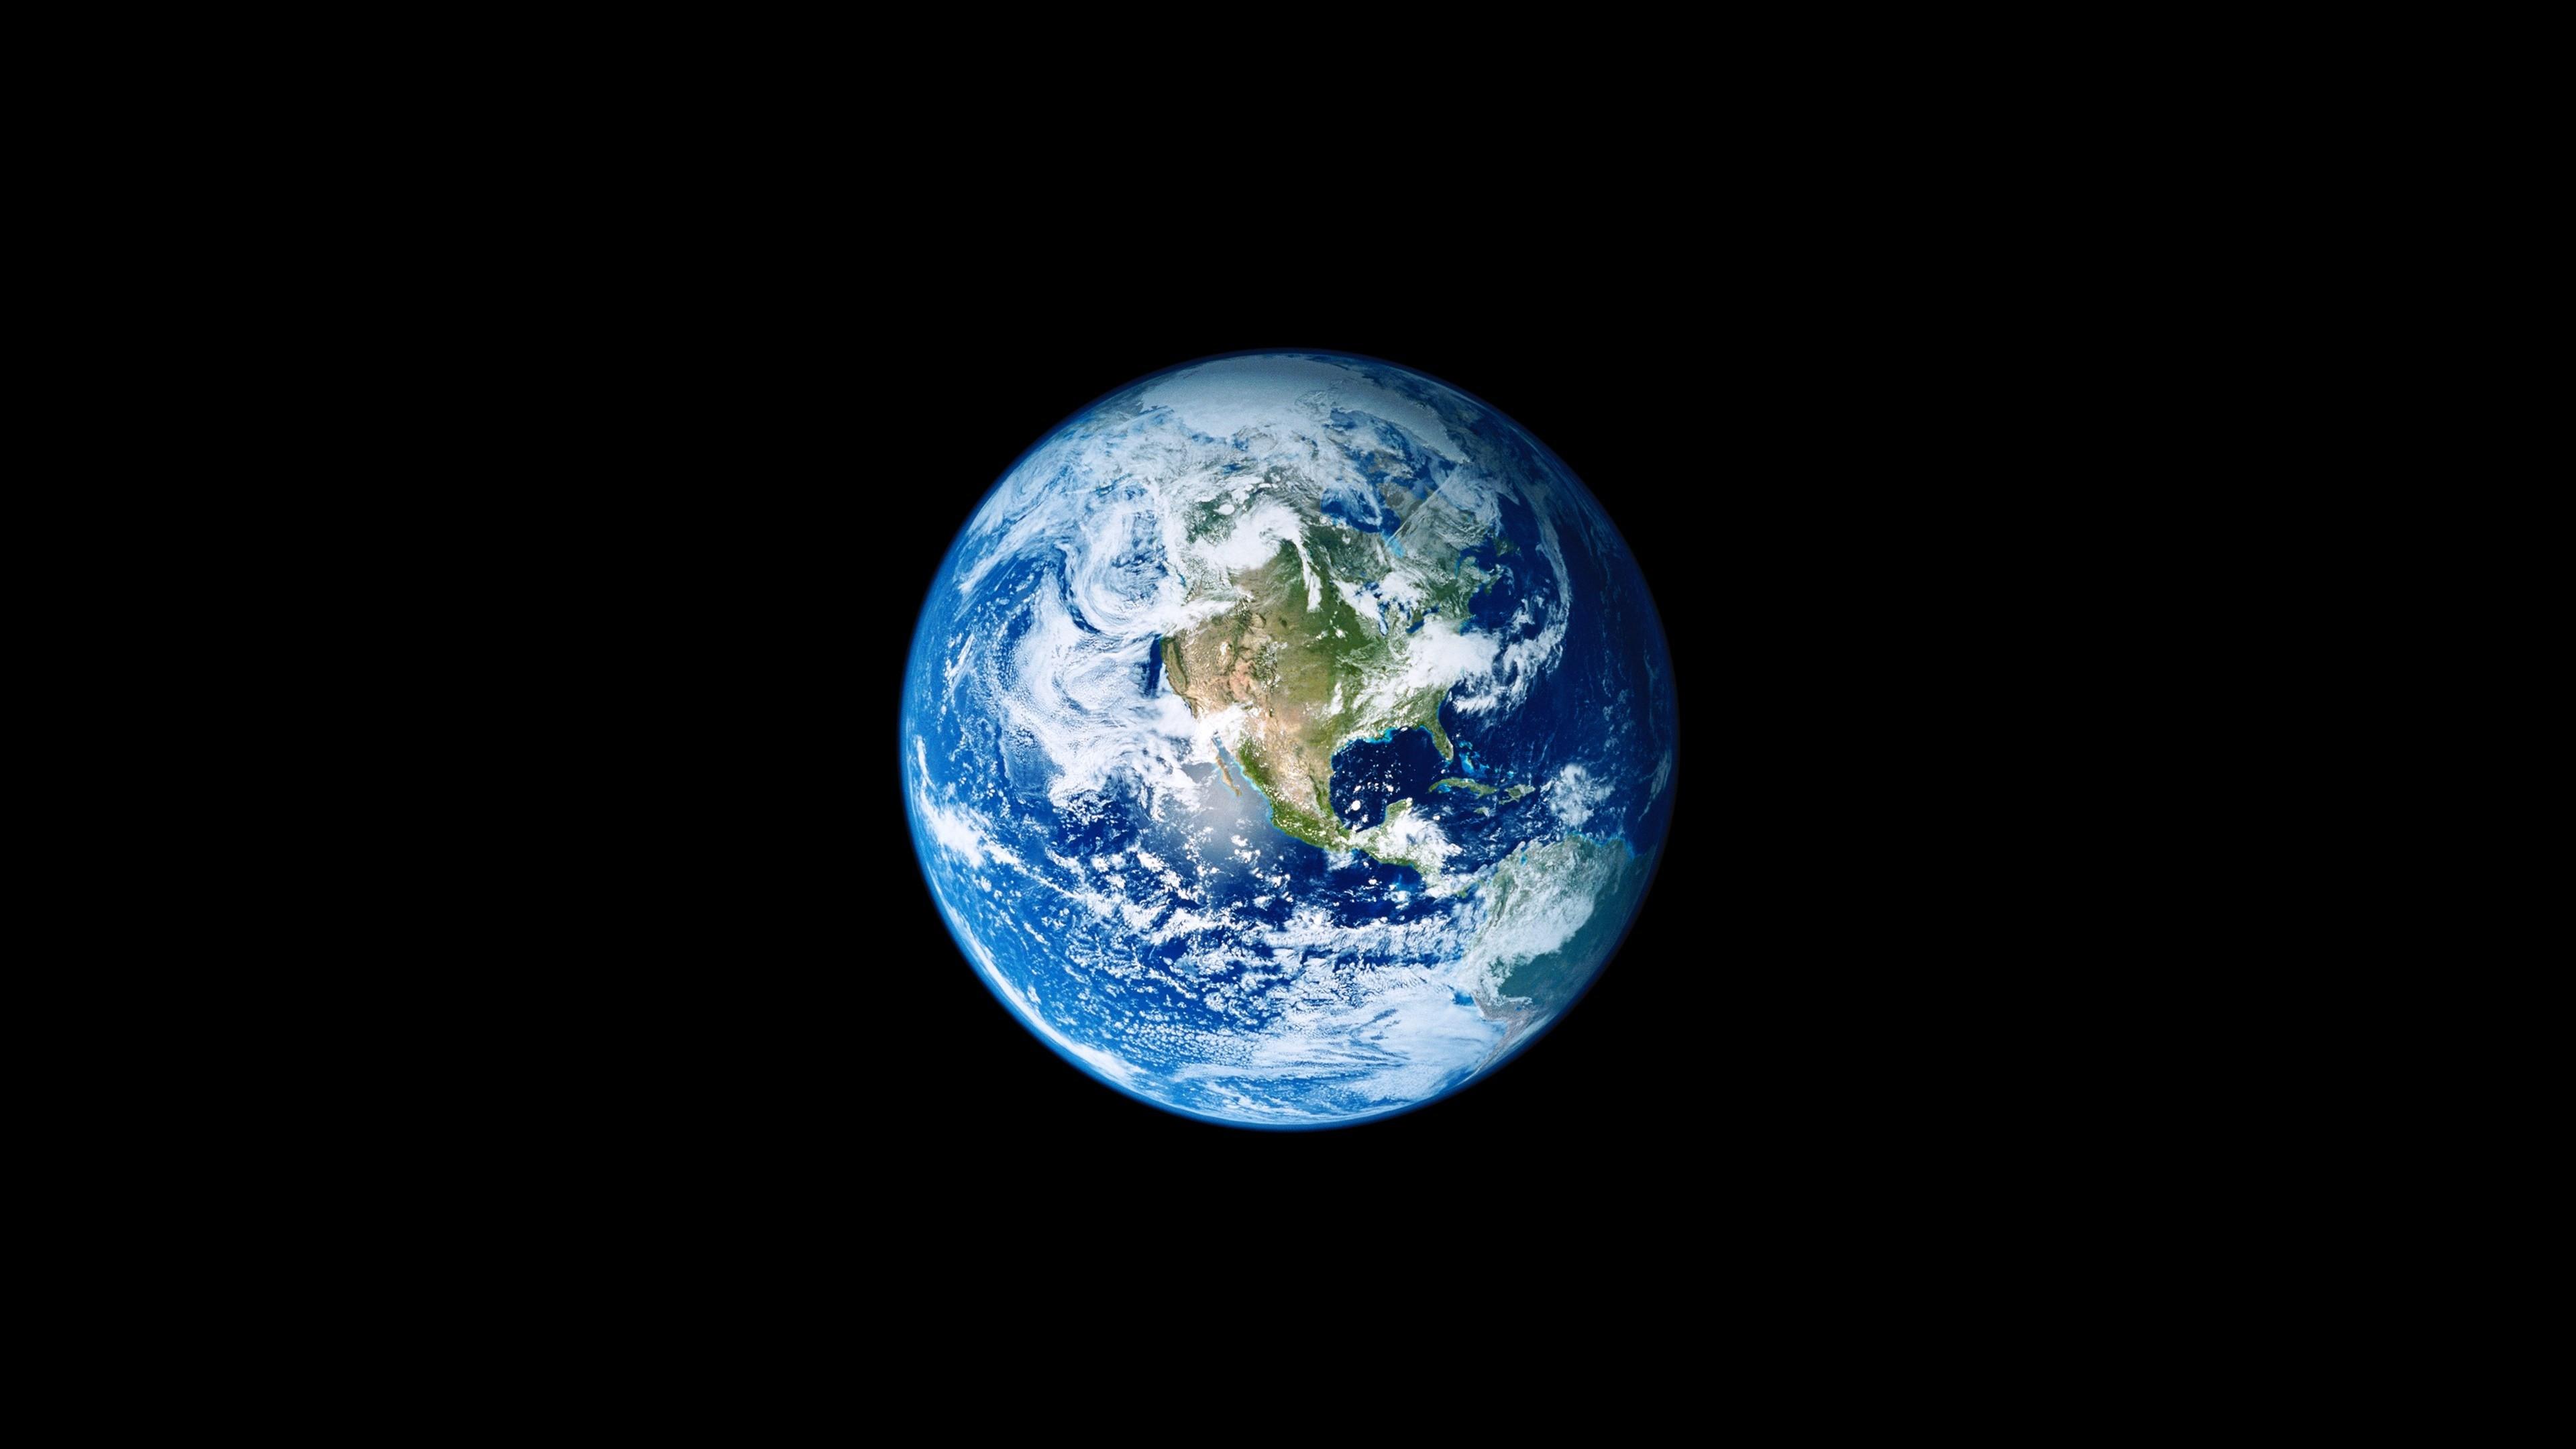 Earth iPhone X 4K Wallpaper